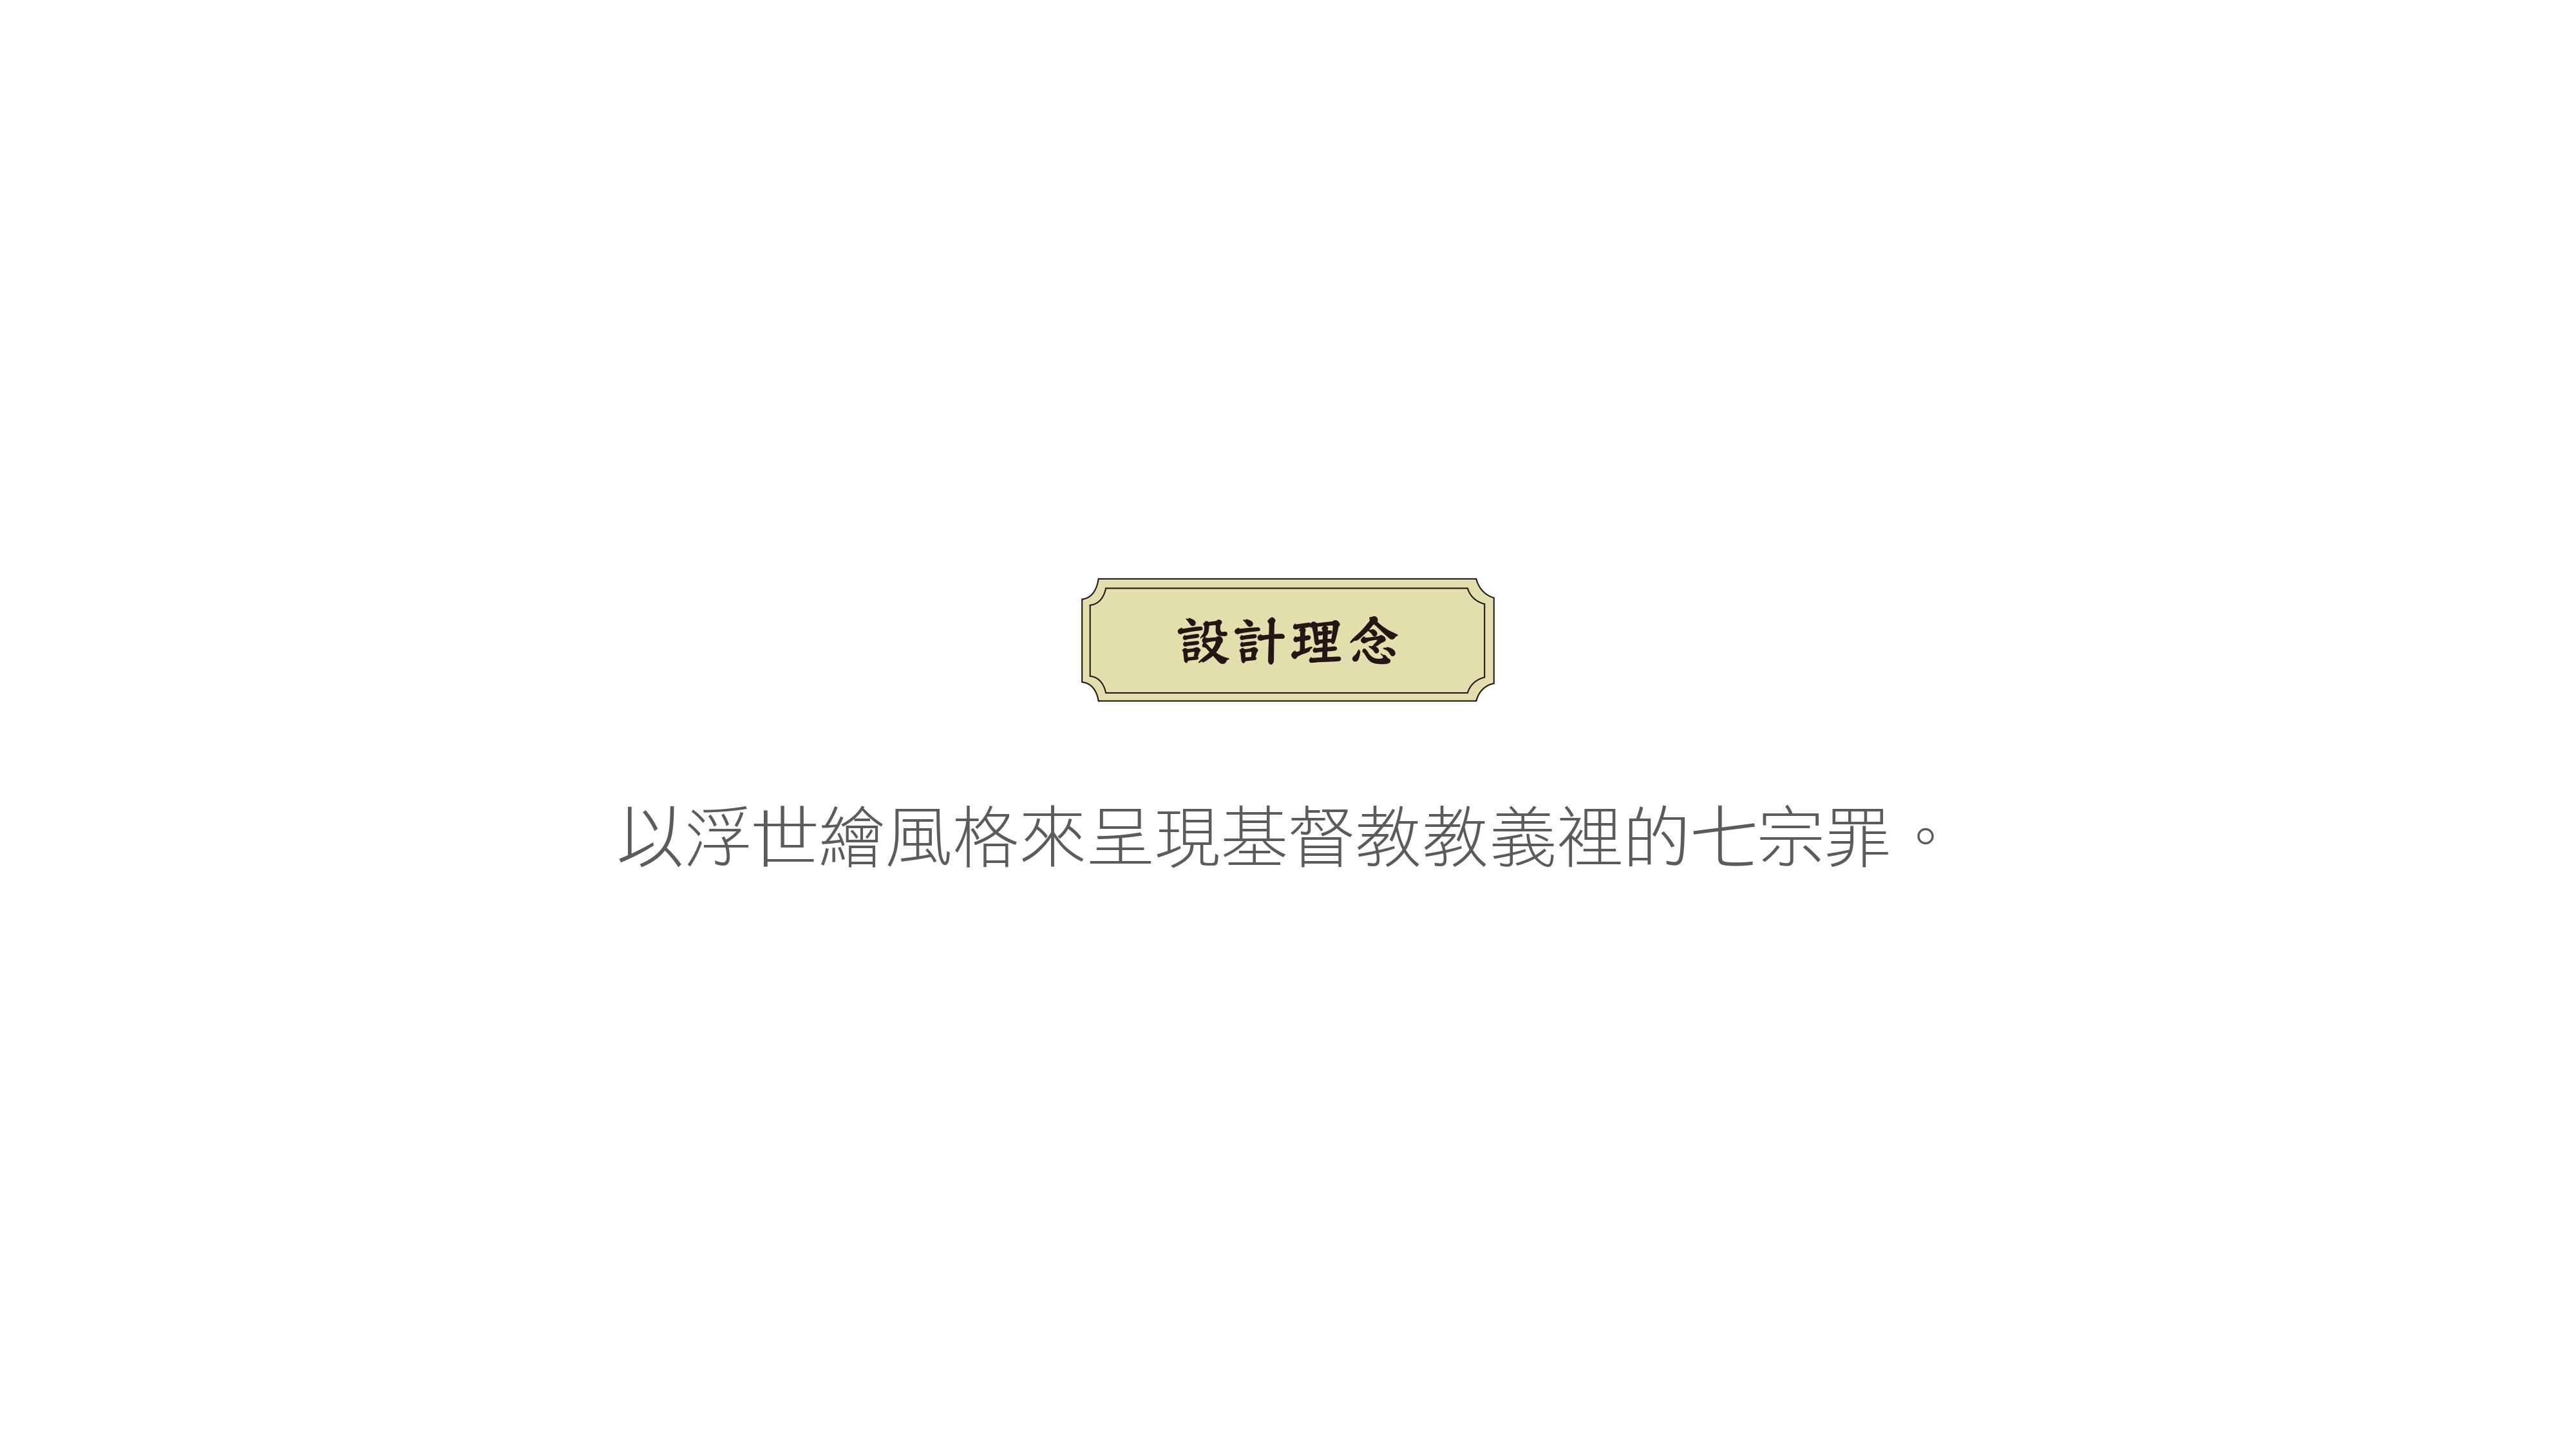 七宗罪_pages-to-jpg-0002